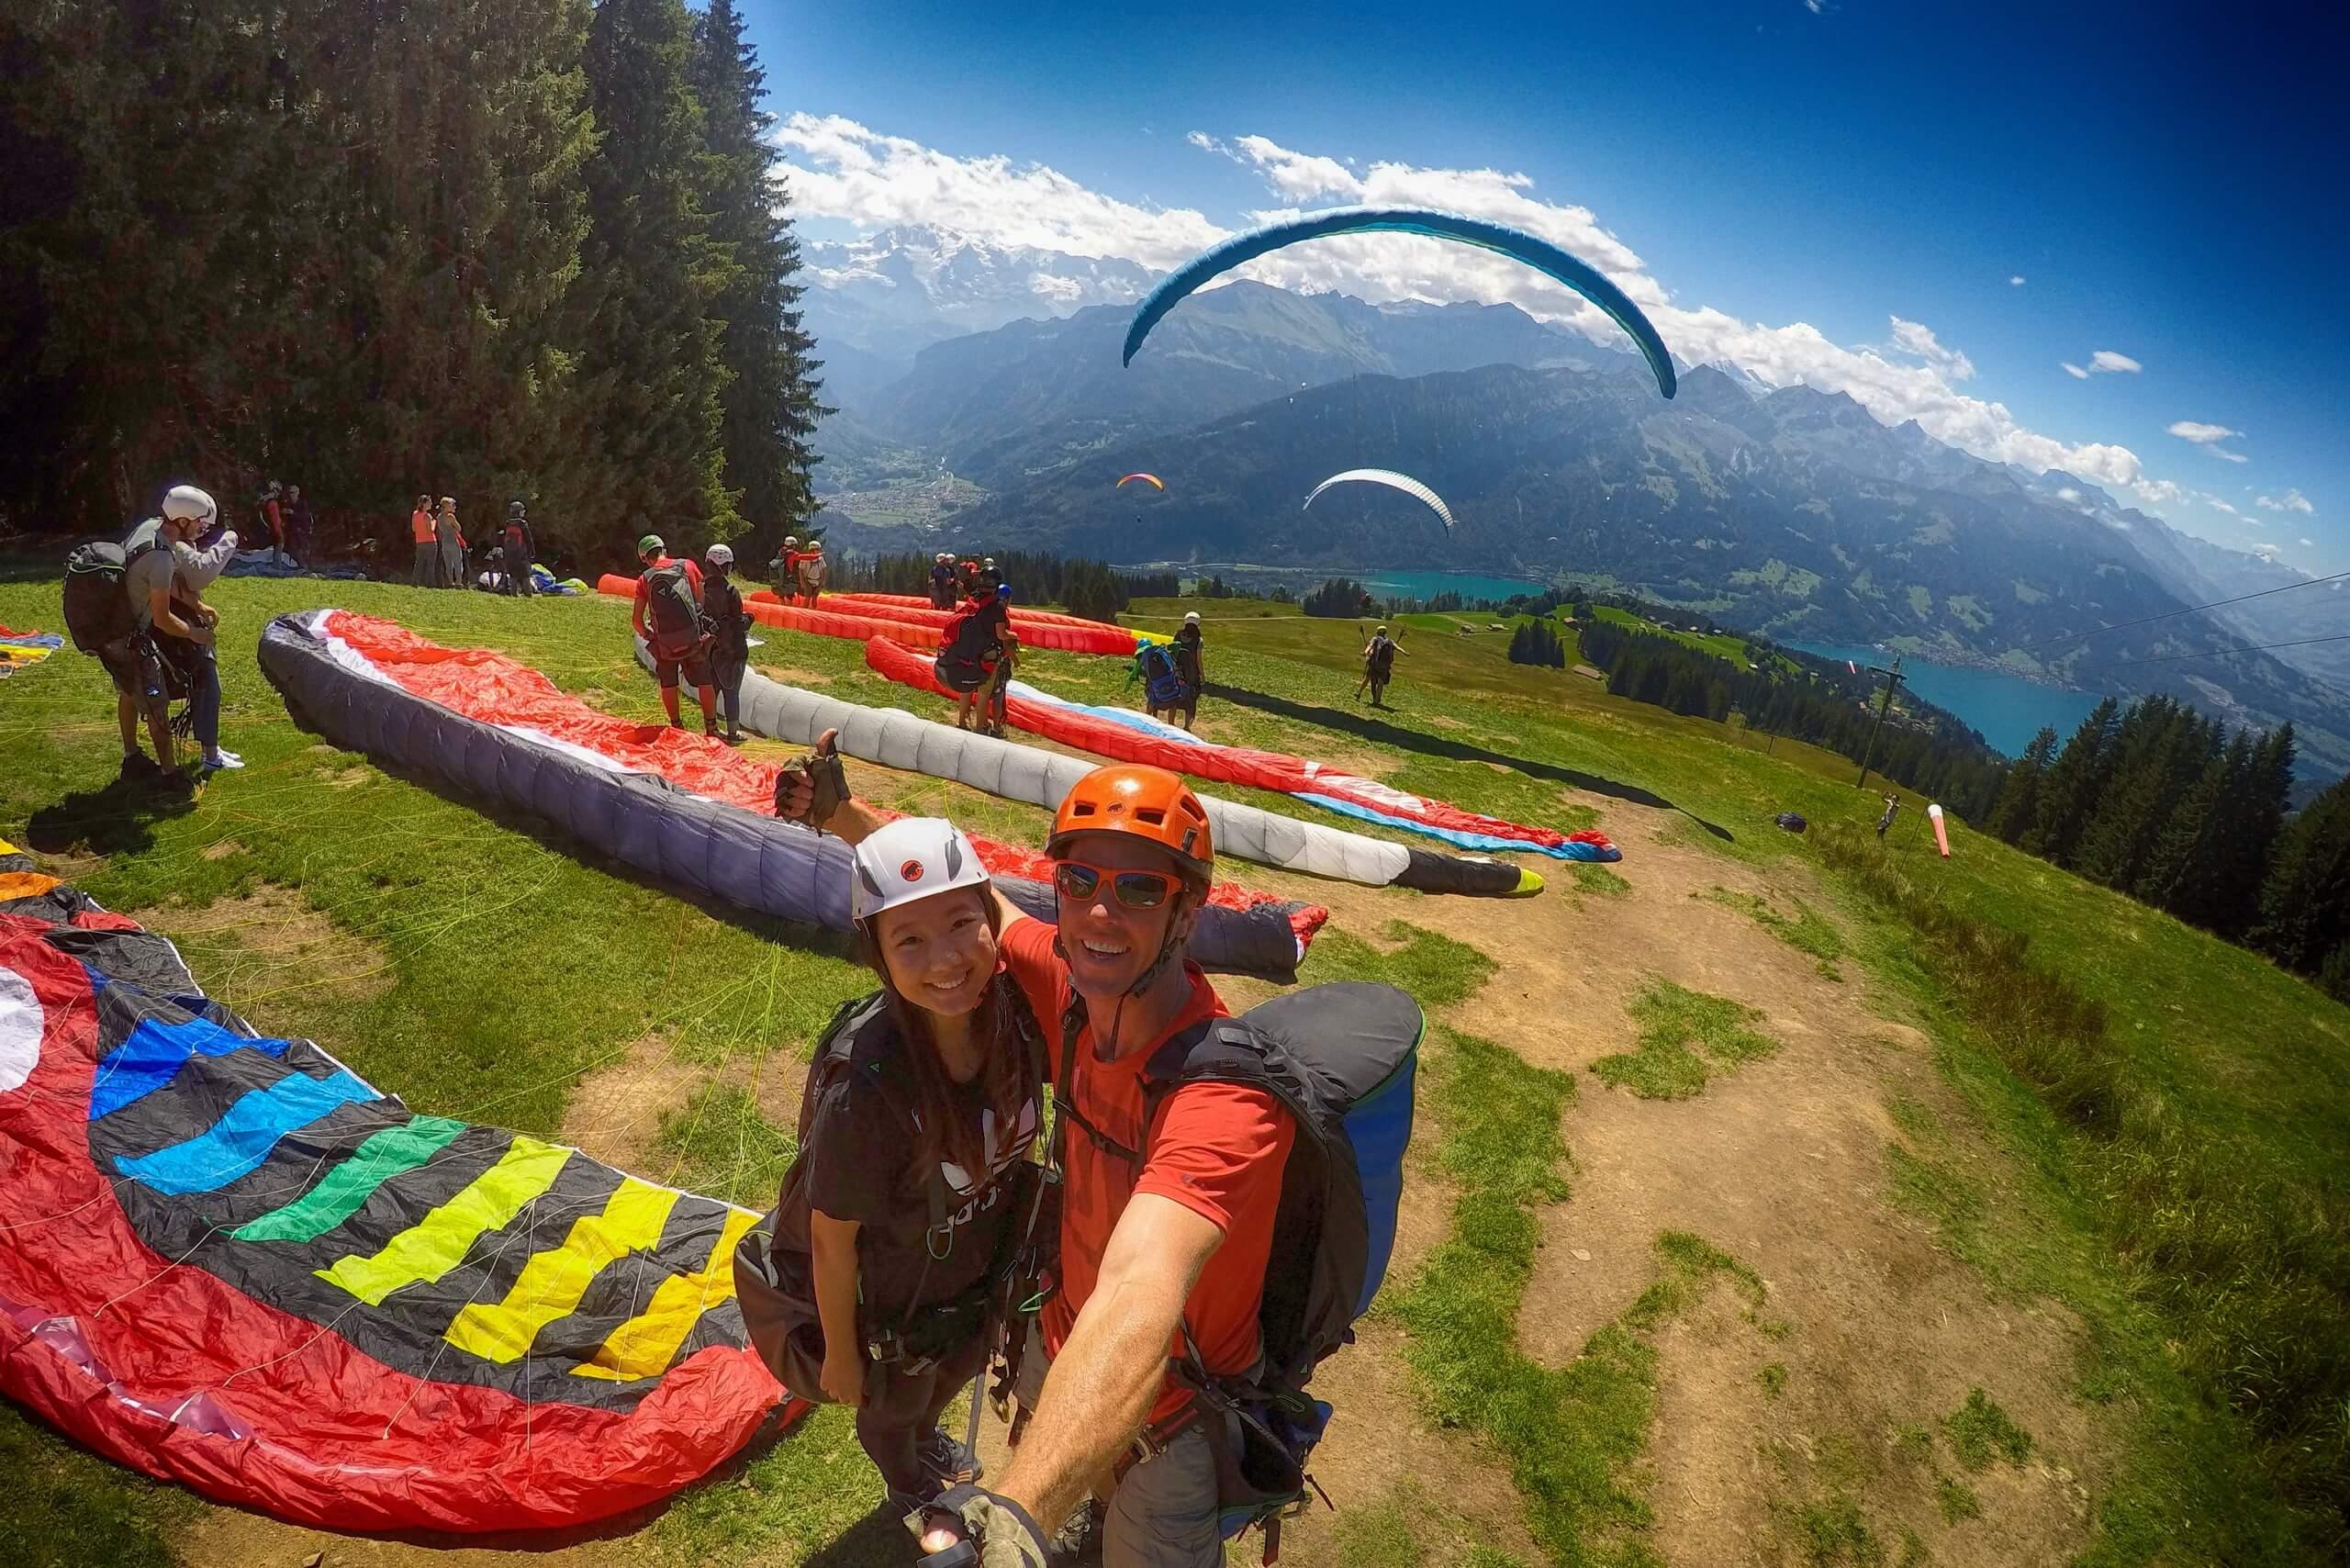 interlaken-paragliding-alpinair-sommer-interlaken-beatenberg